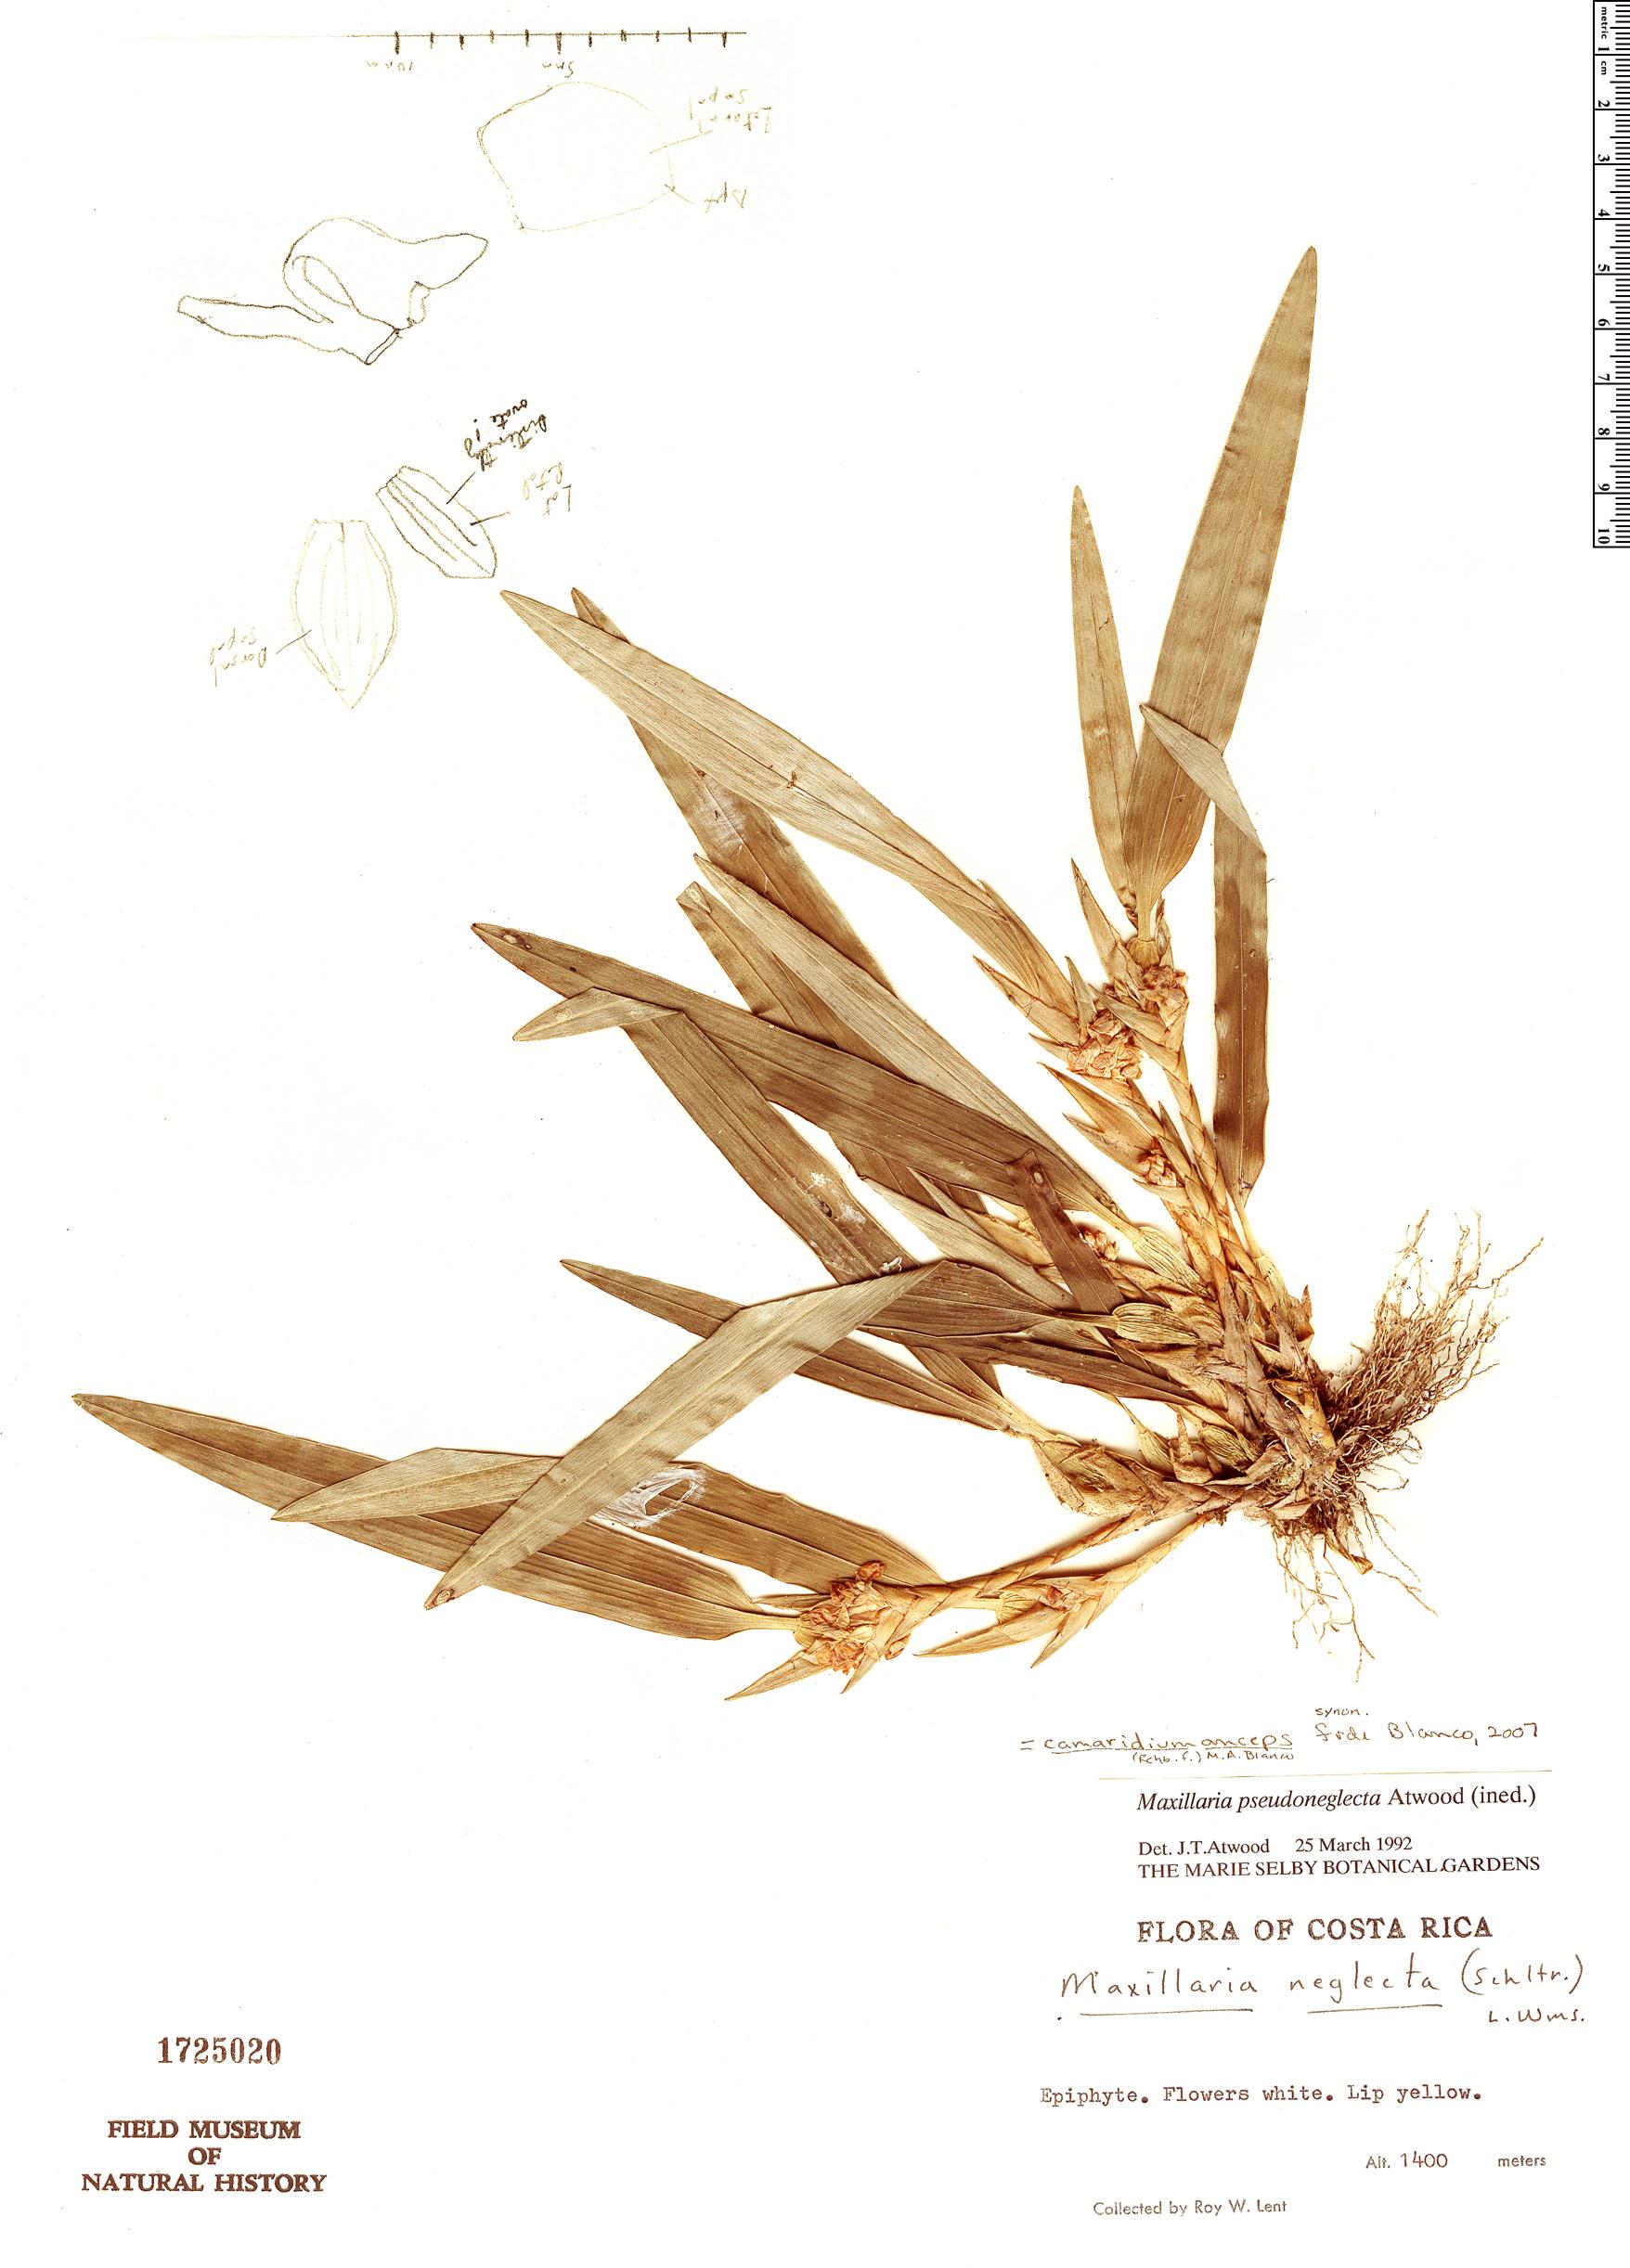 Espécime: Maxillaria pseudoneglecta